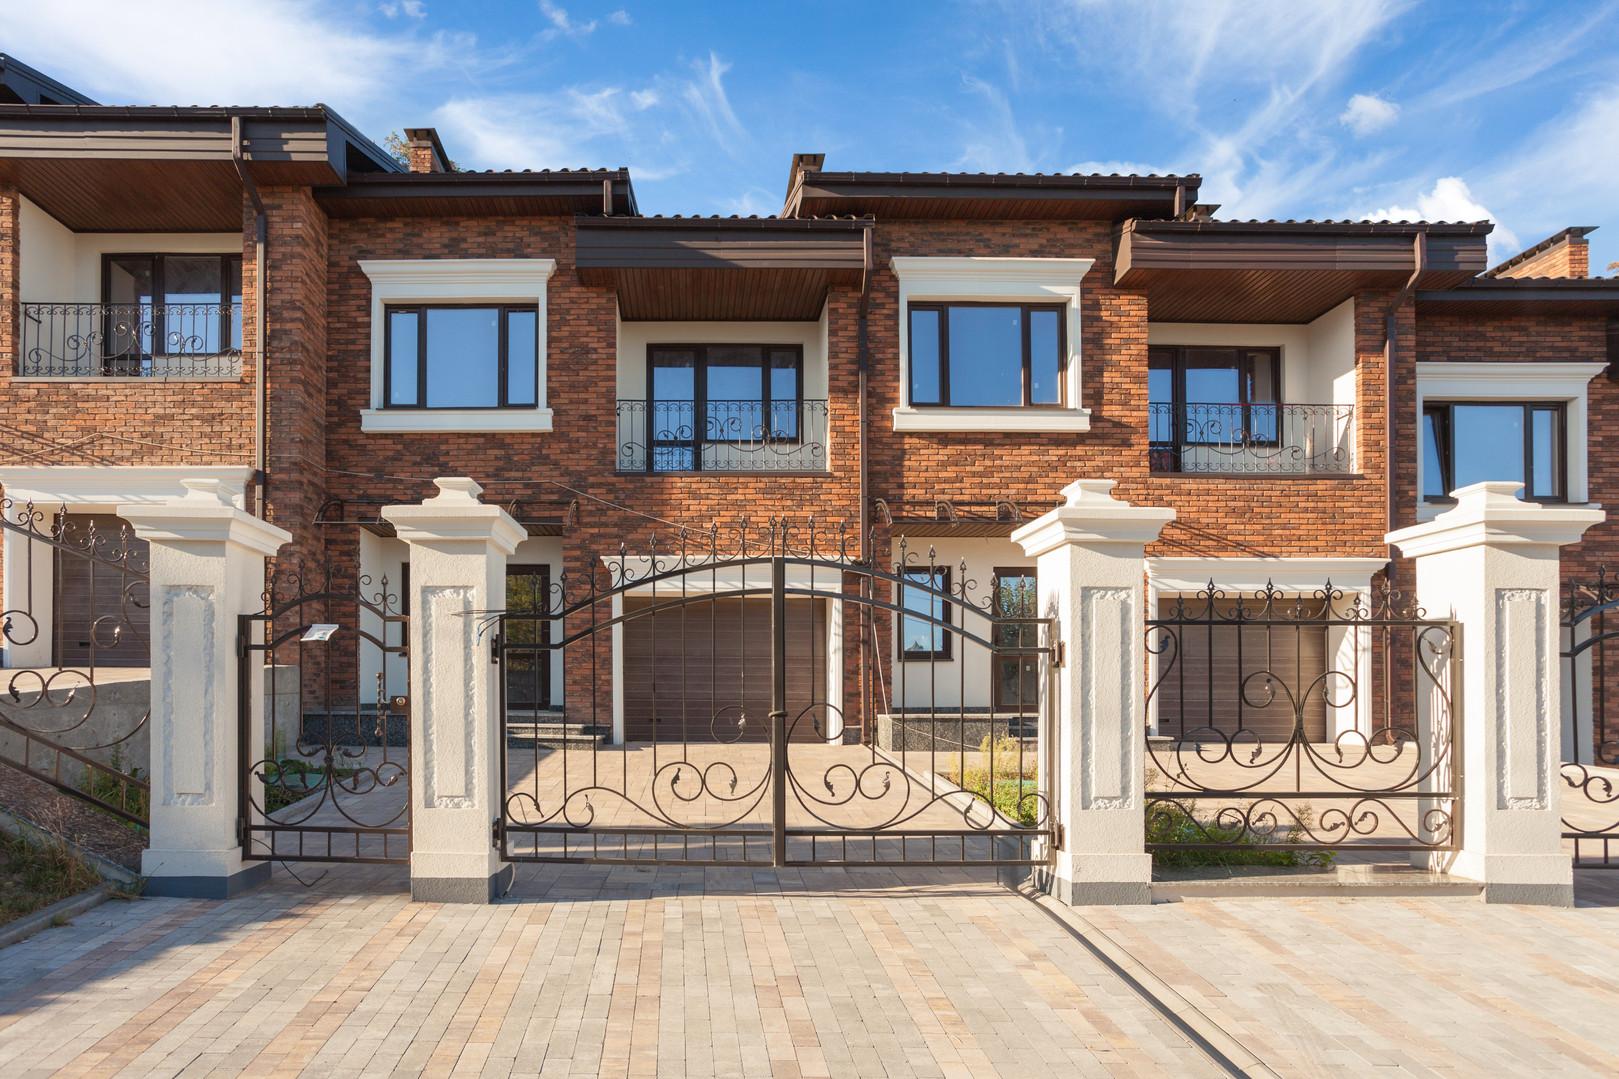 Modern brick house with plastic windows,